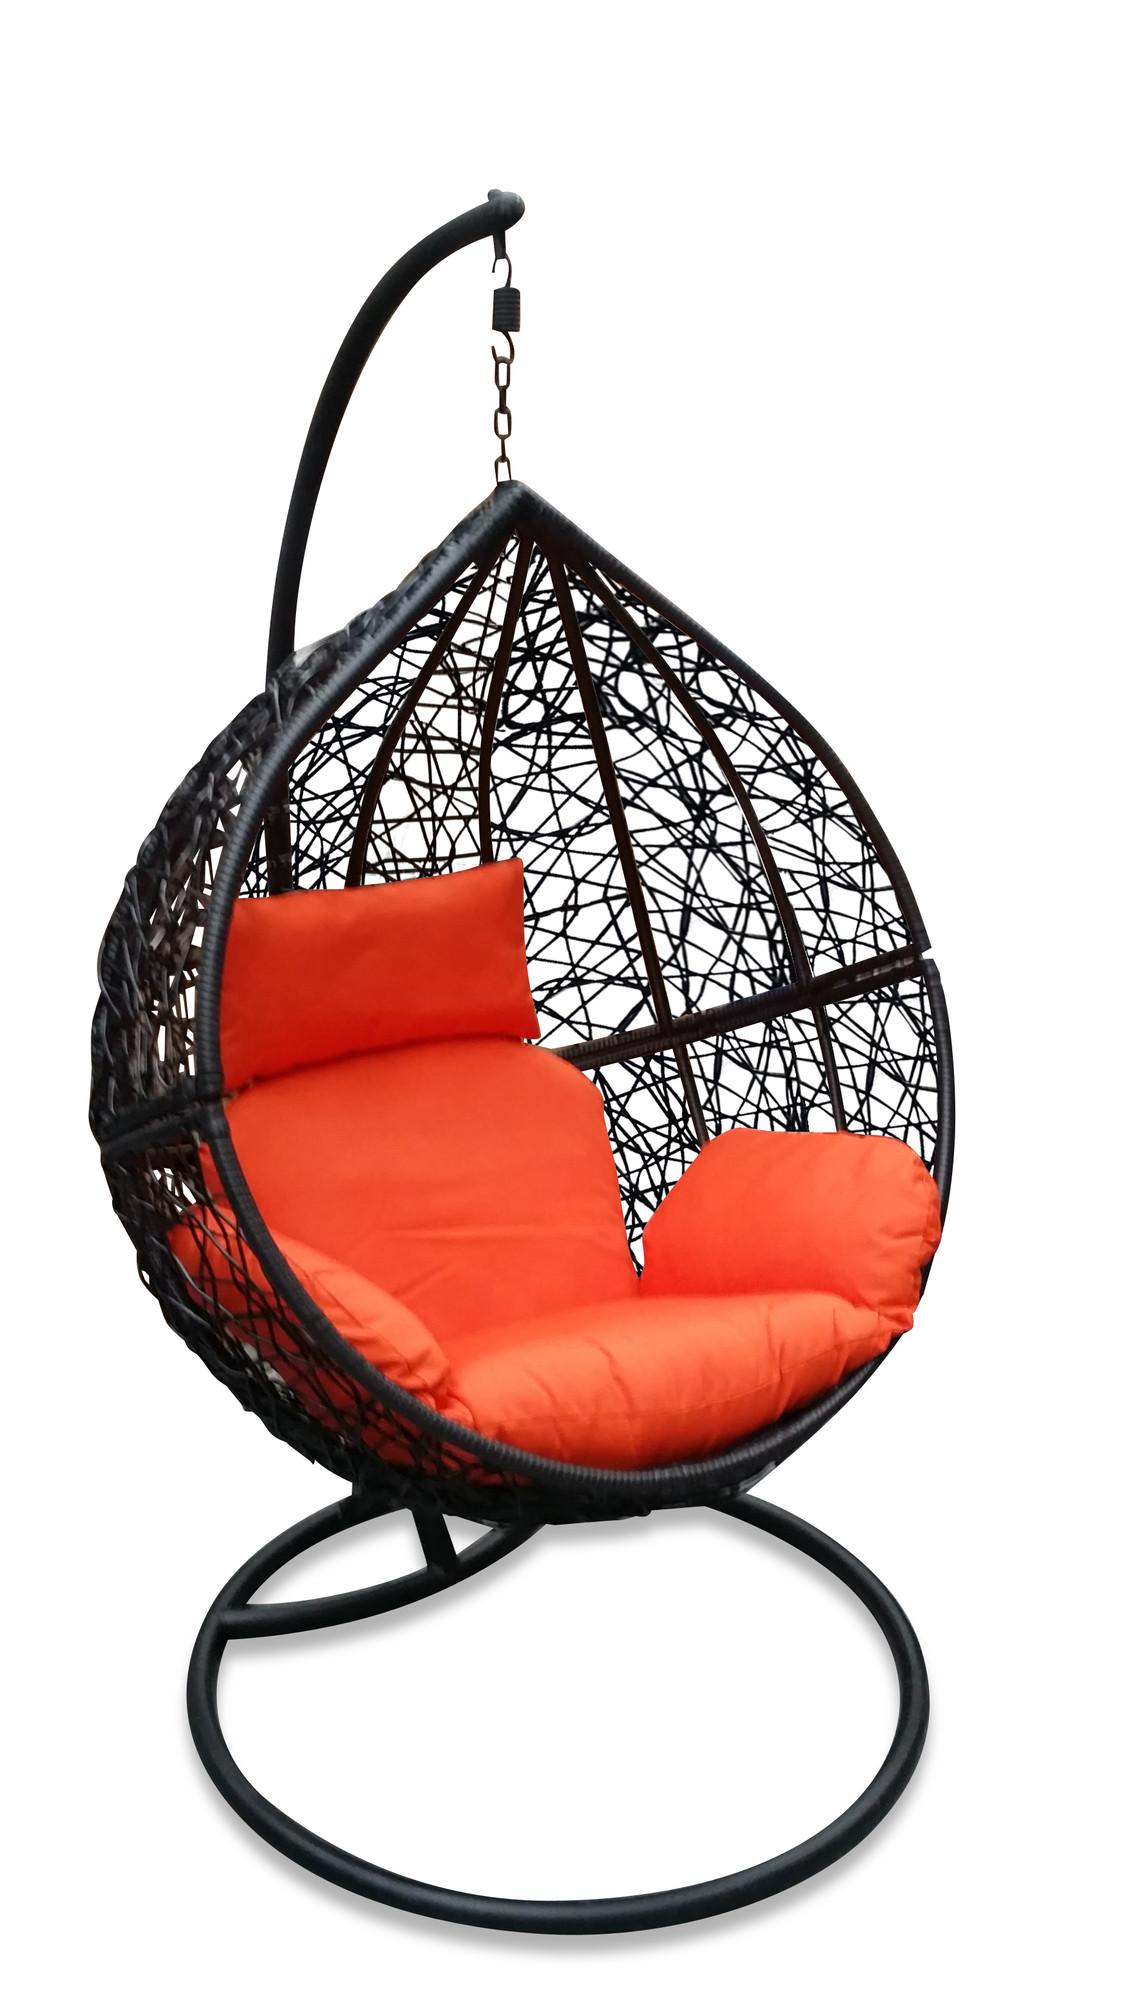 NEW Black Hanging Ball Chair